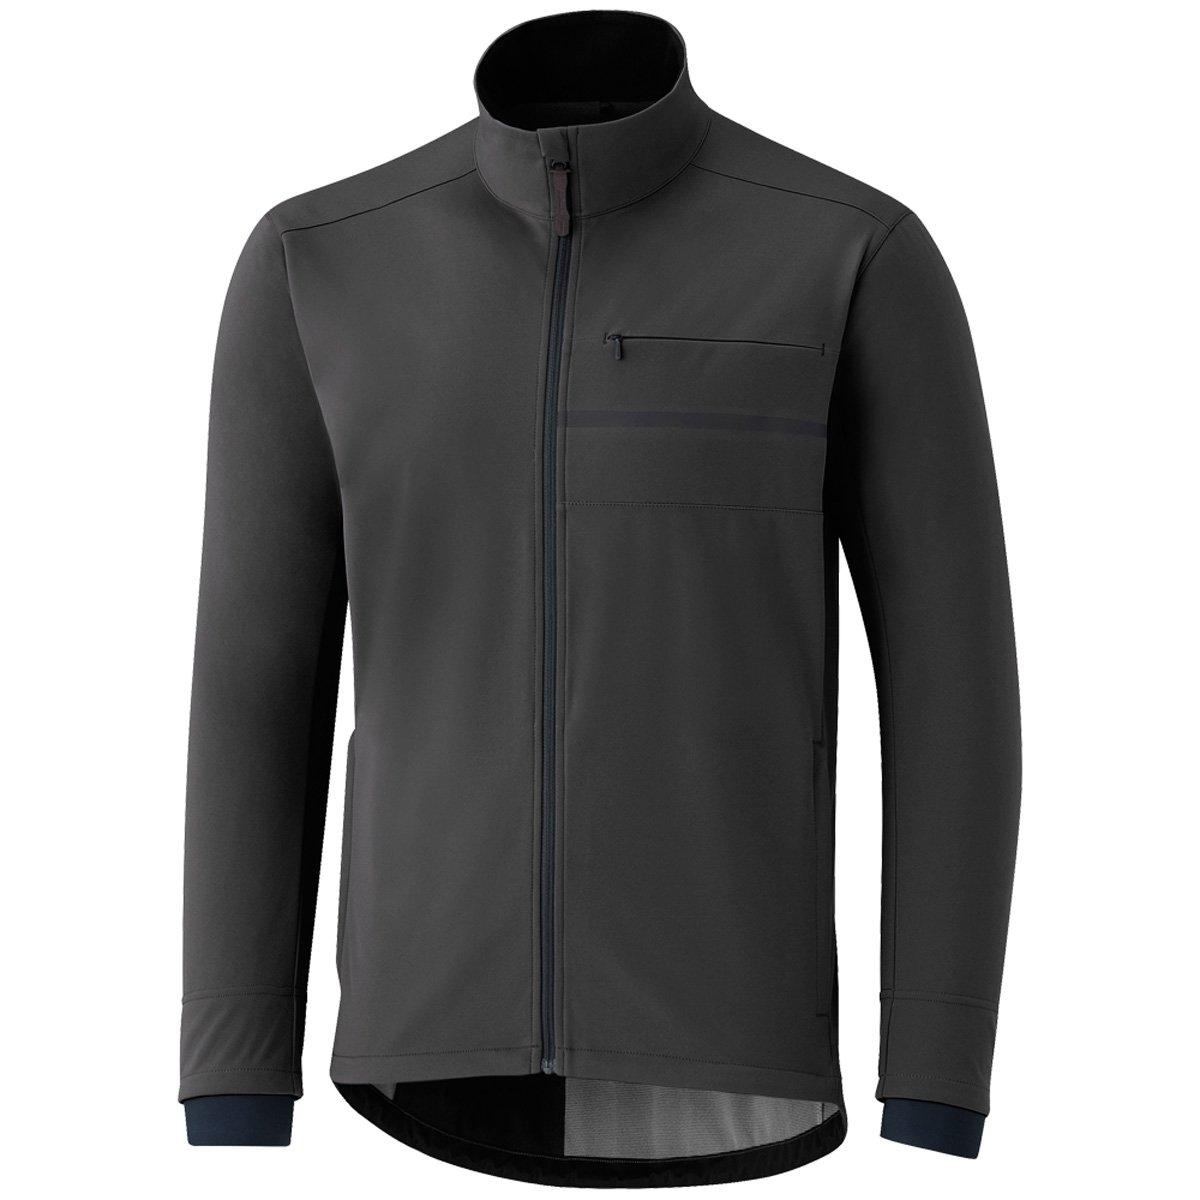 Shihommeo Veste Cyclisme Transit Softshell Dark gris (L, gris)